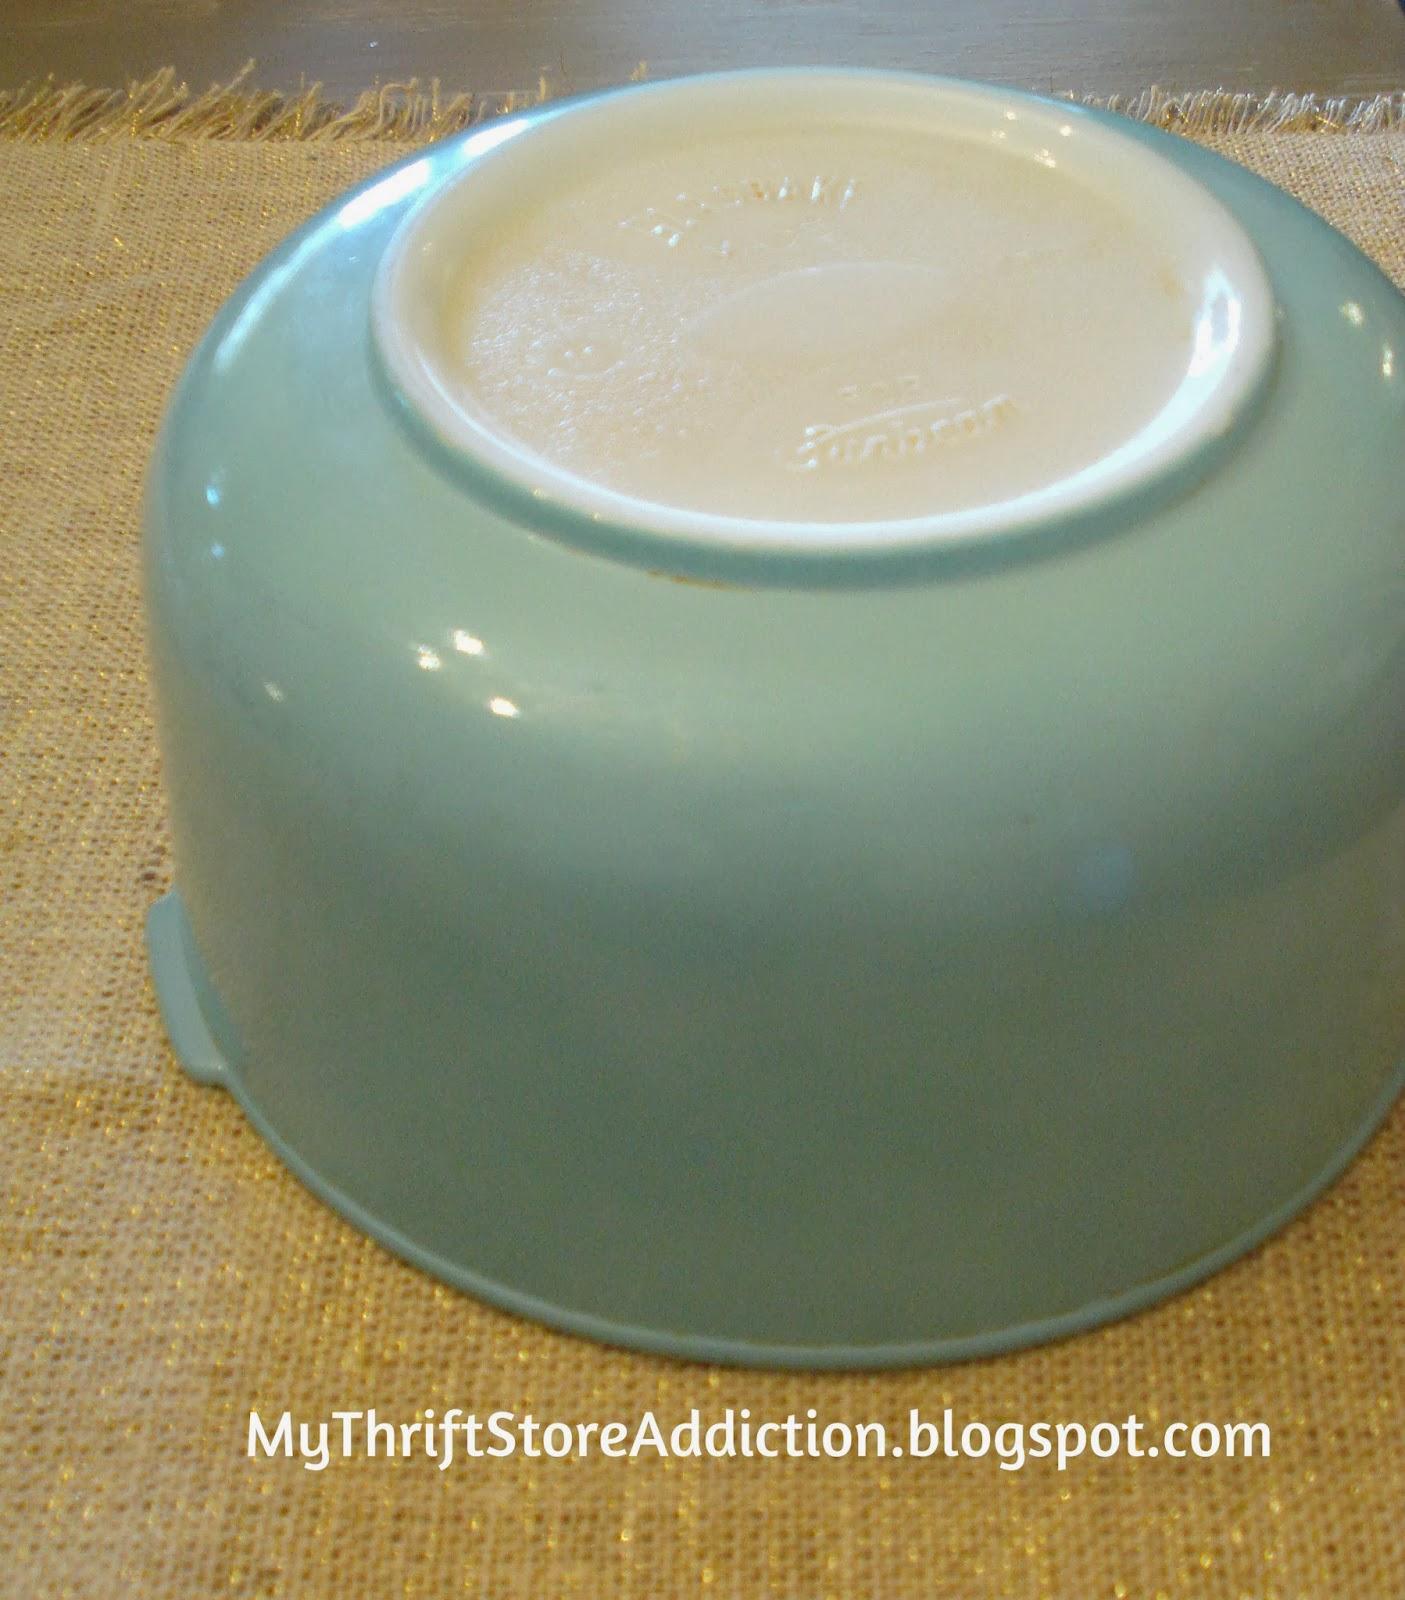 Vintage Sunbeam Glasbake mixing bowl